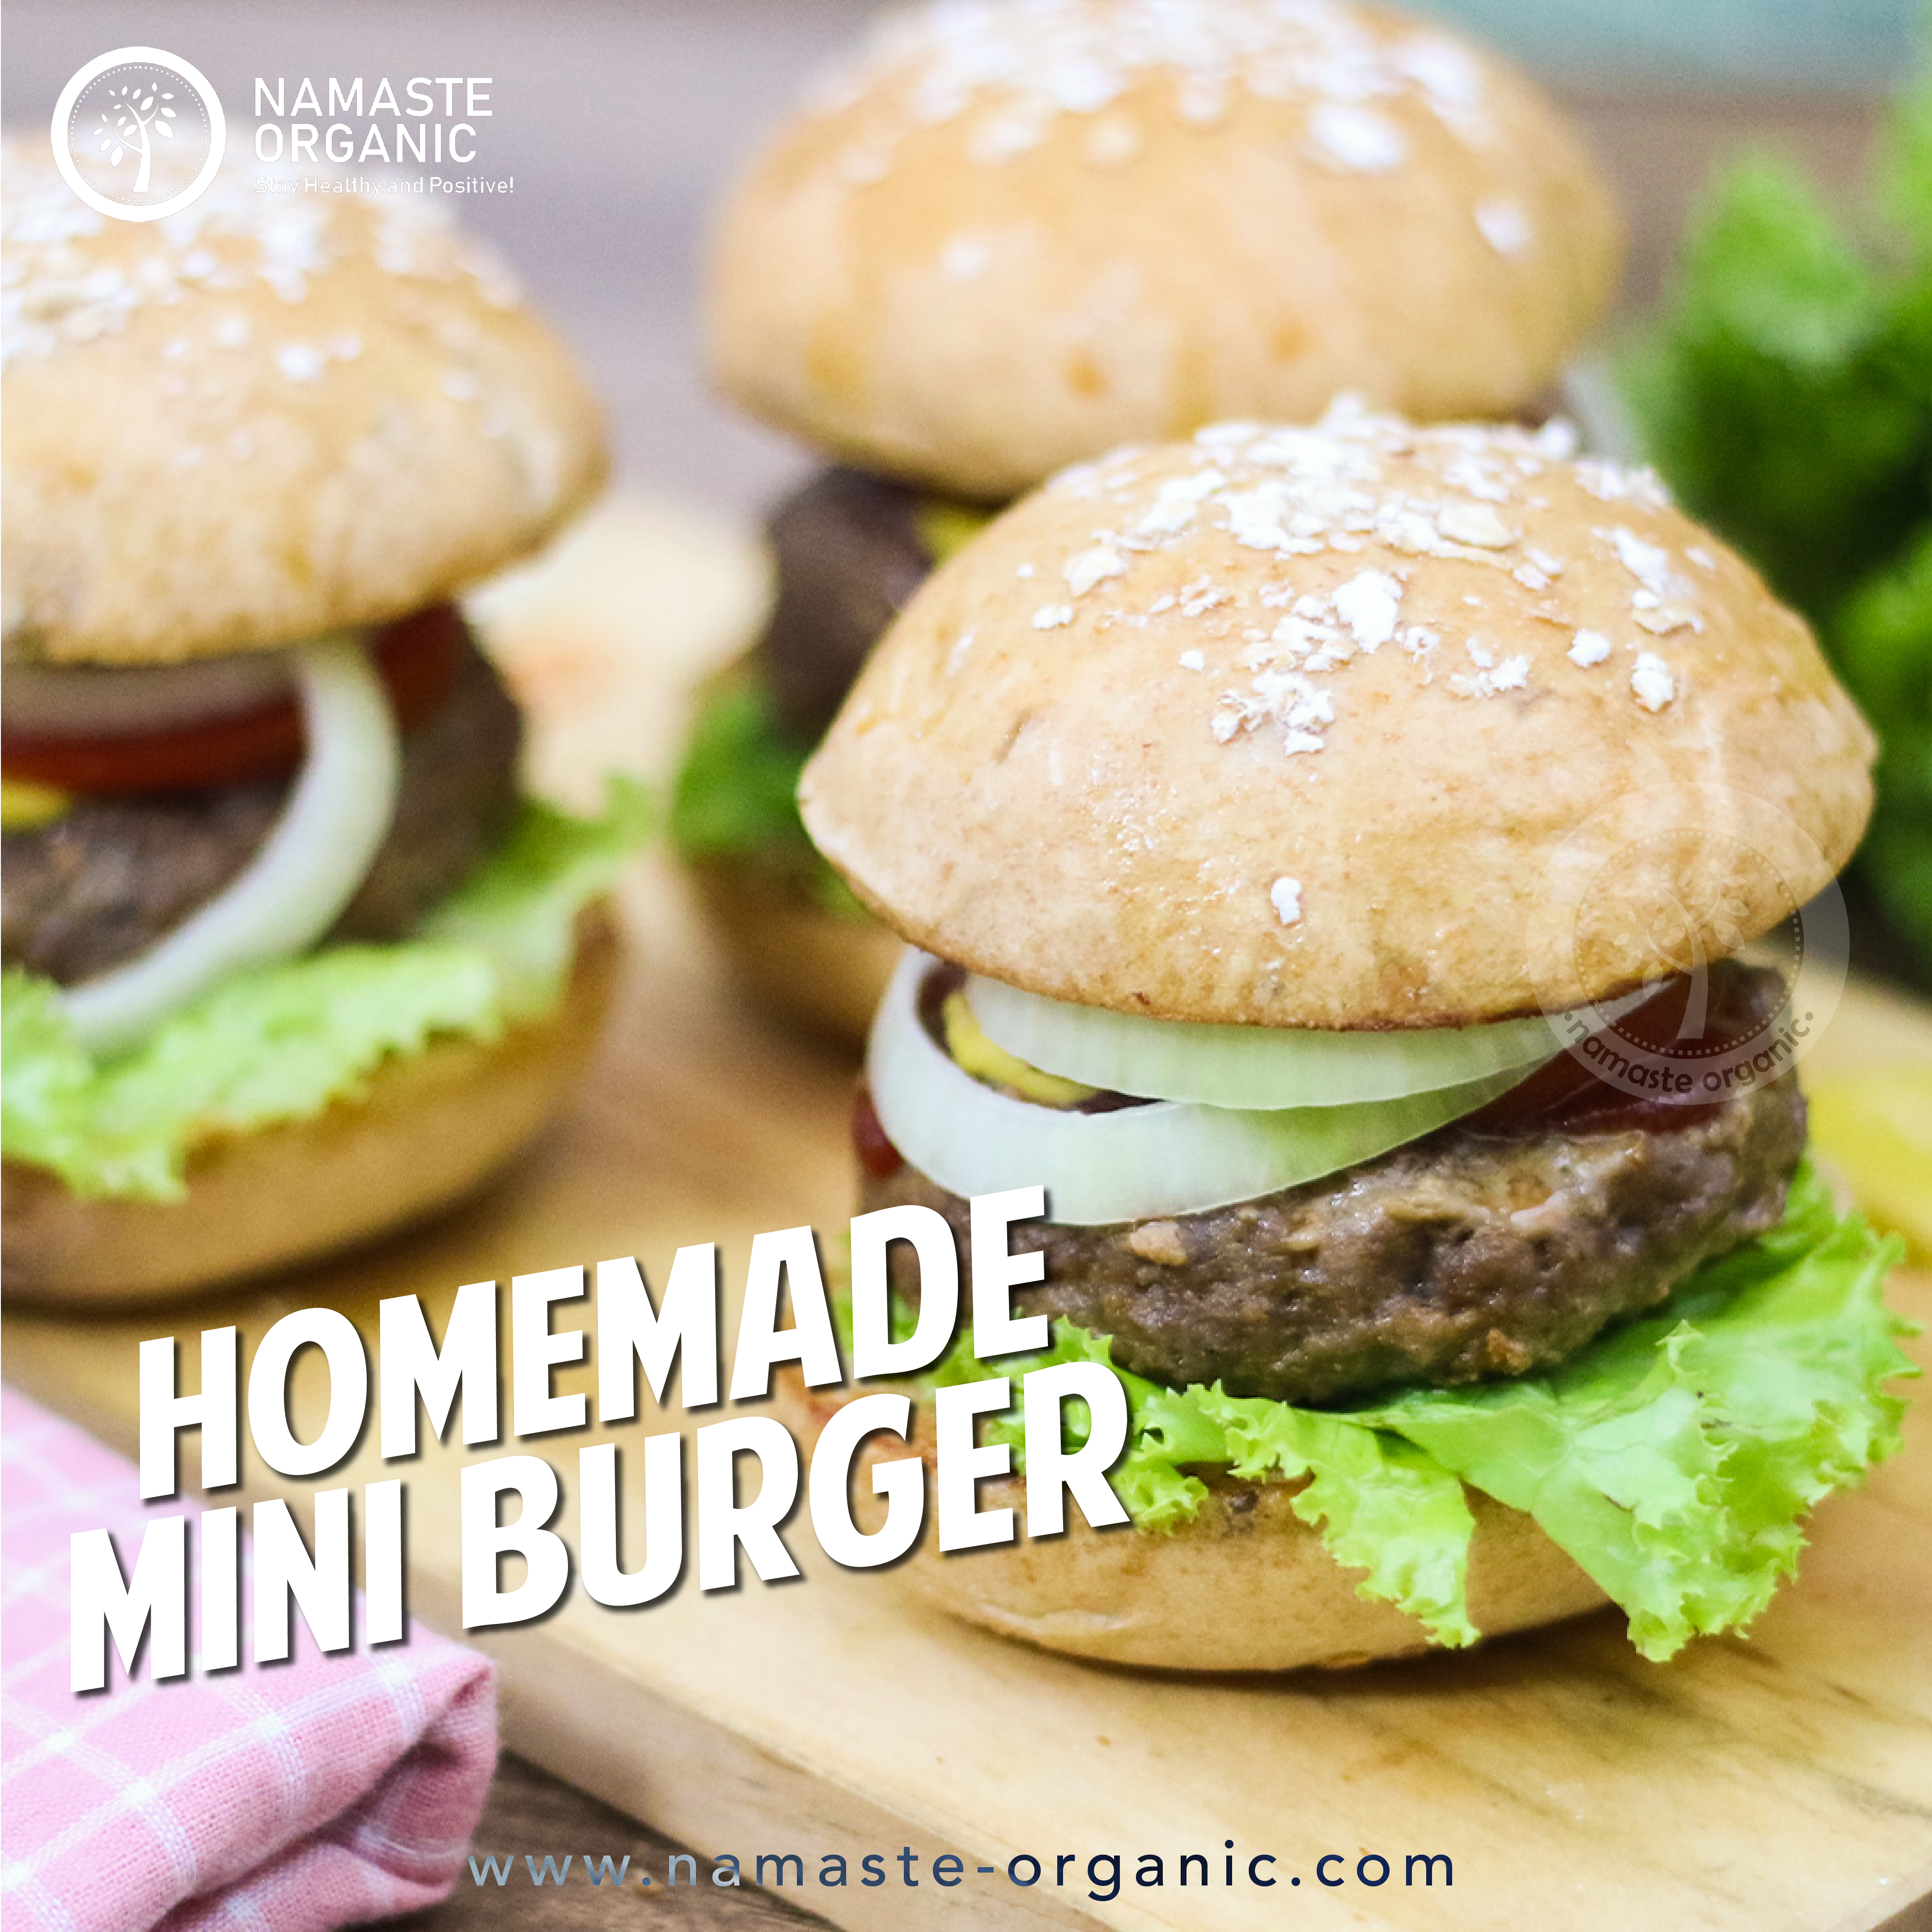 Healthy Junkfood: Beef Burger image